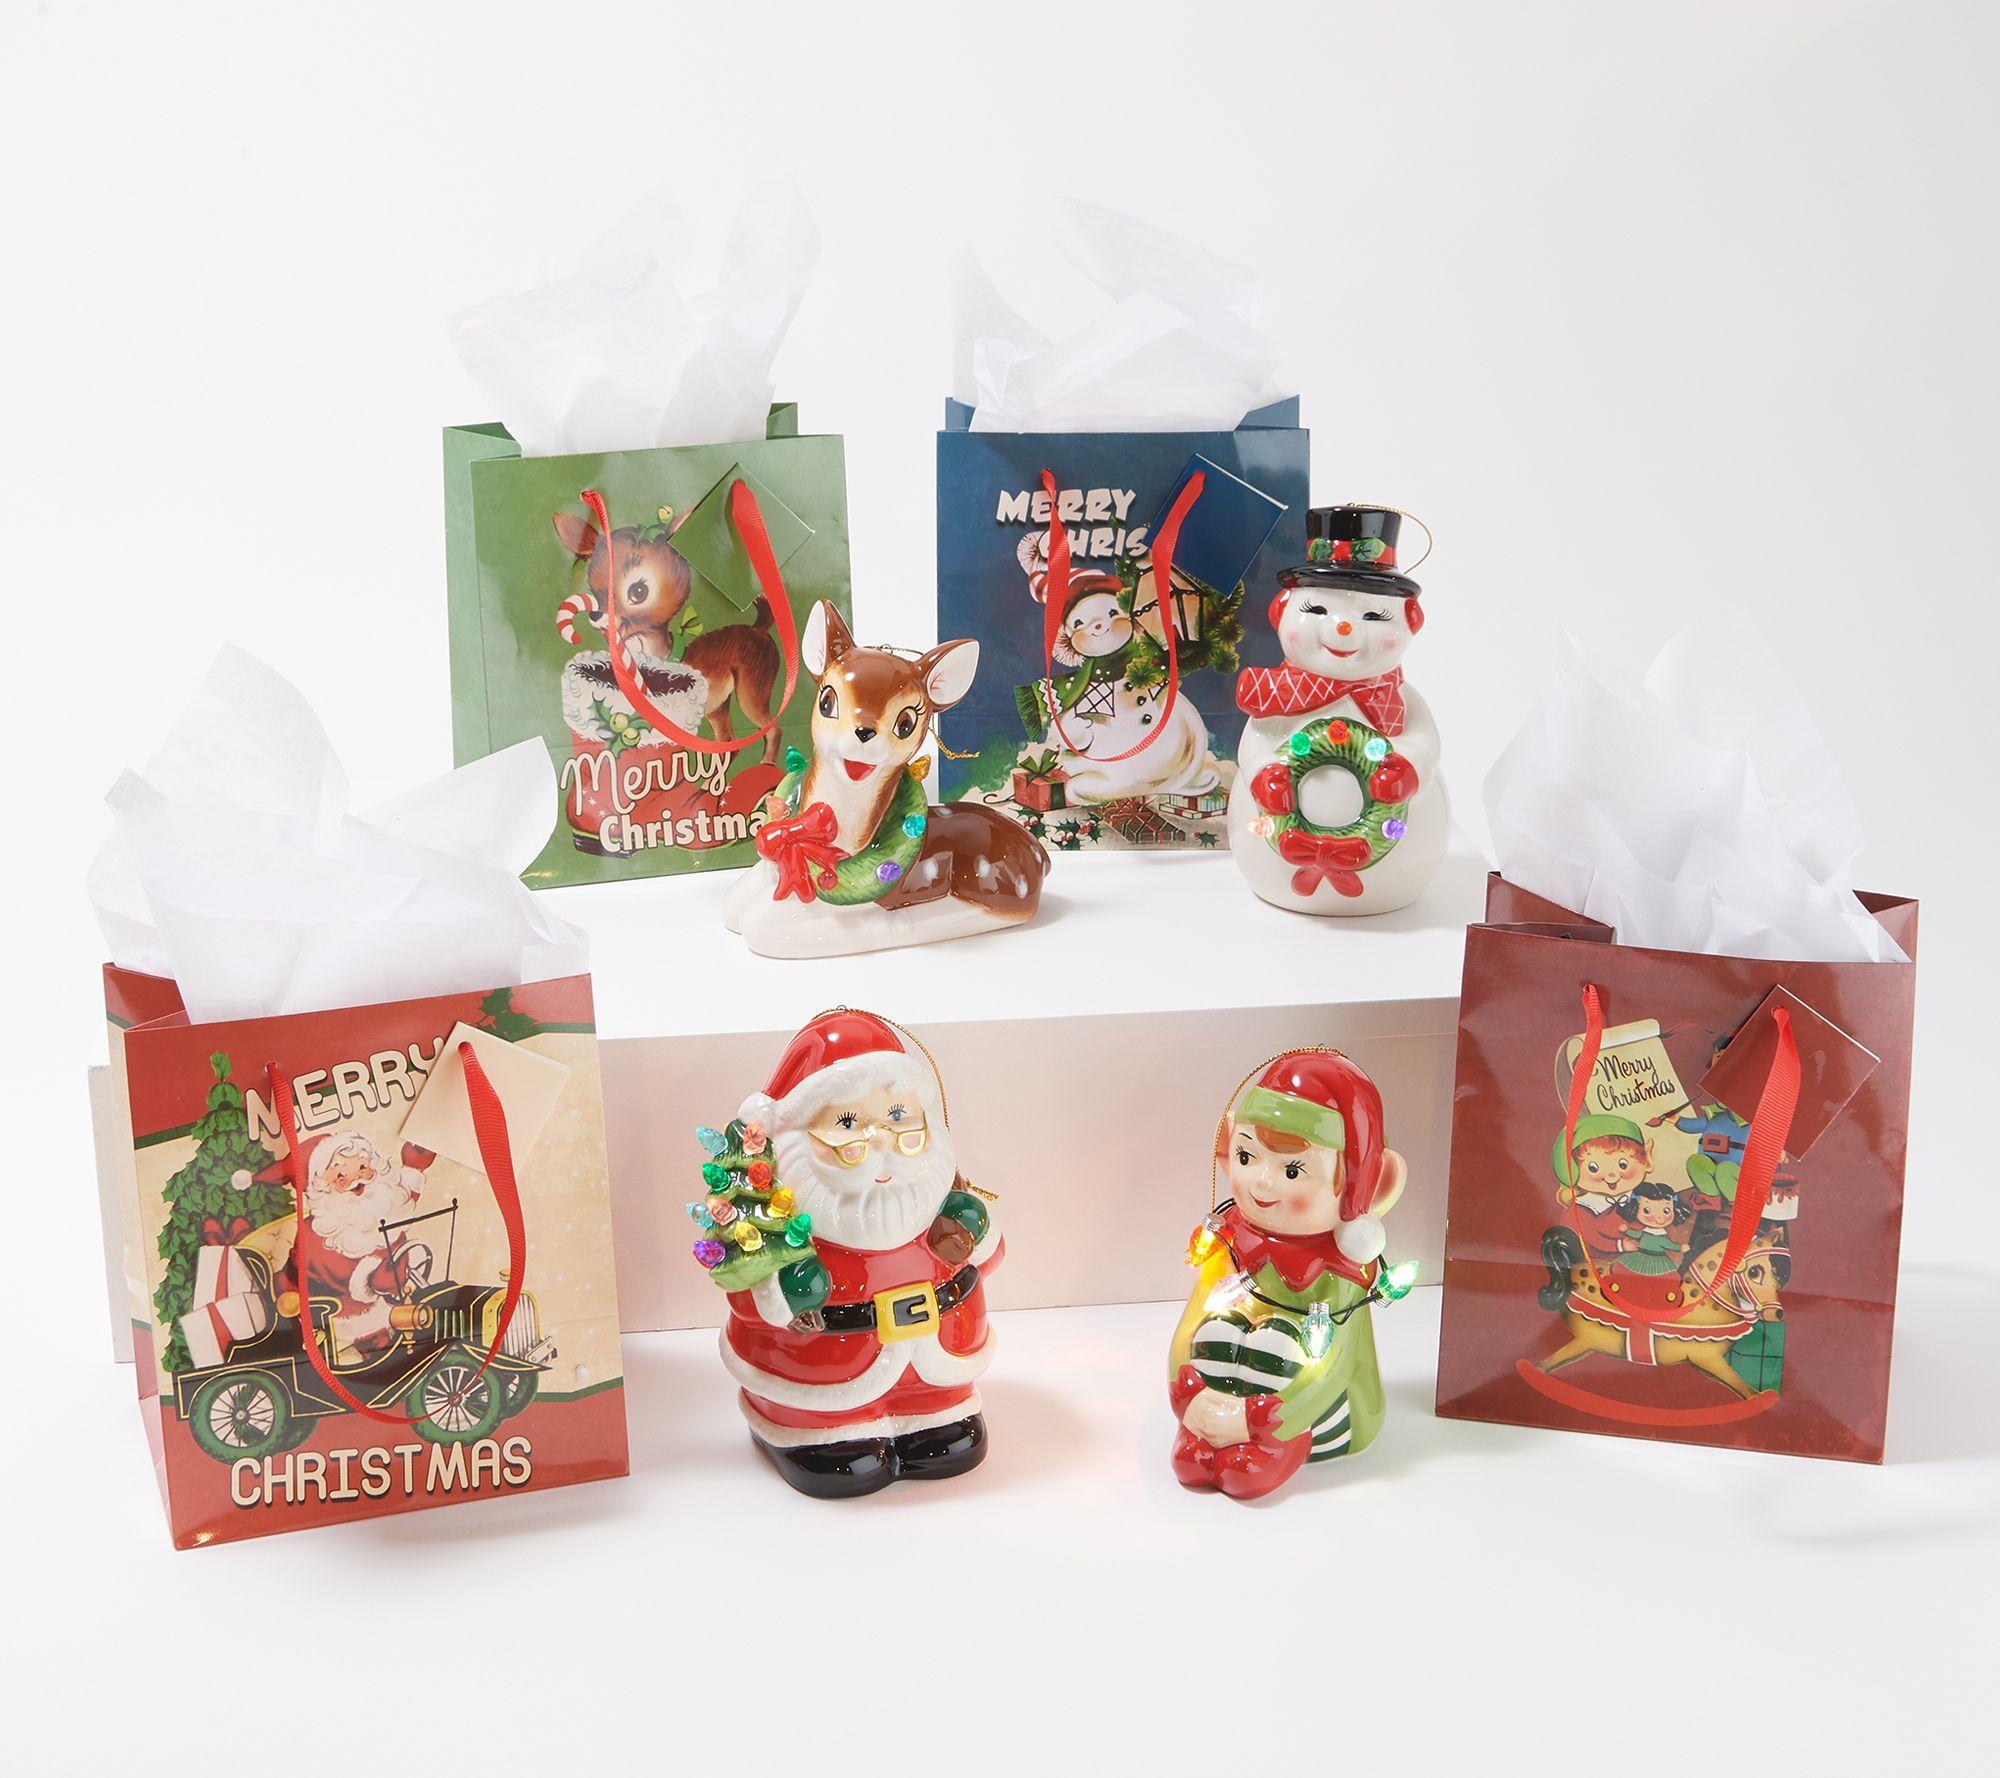 Mr Christmas Set Of 4 Lit Nostalgic Holiday Figures W Bags White Qvc Com